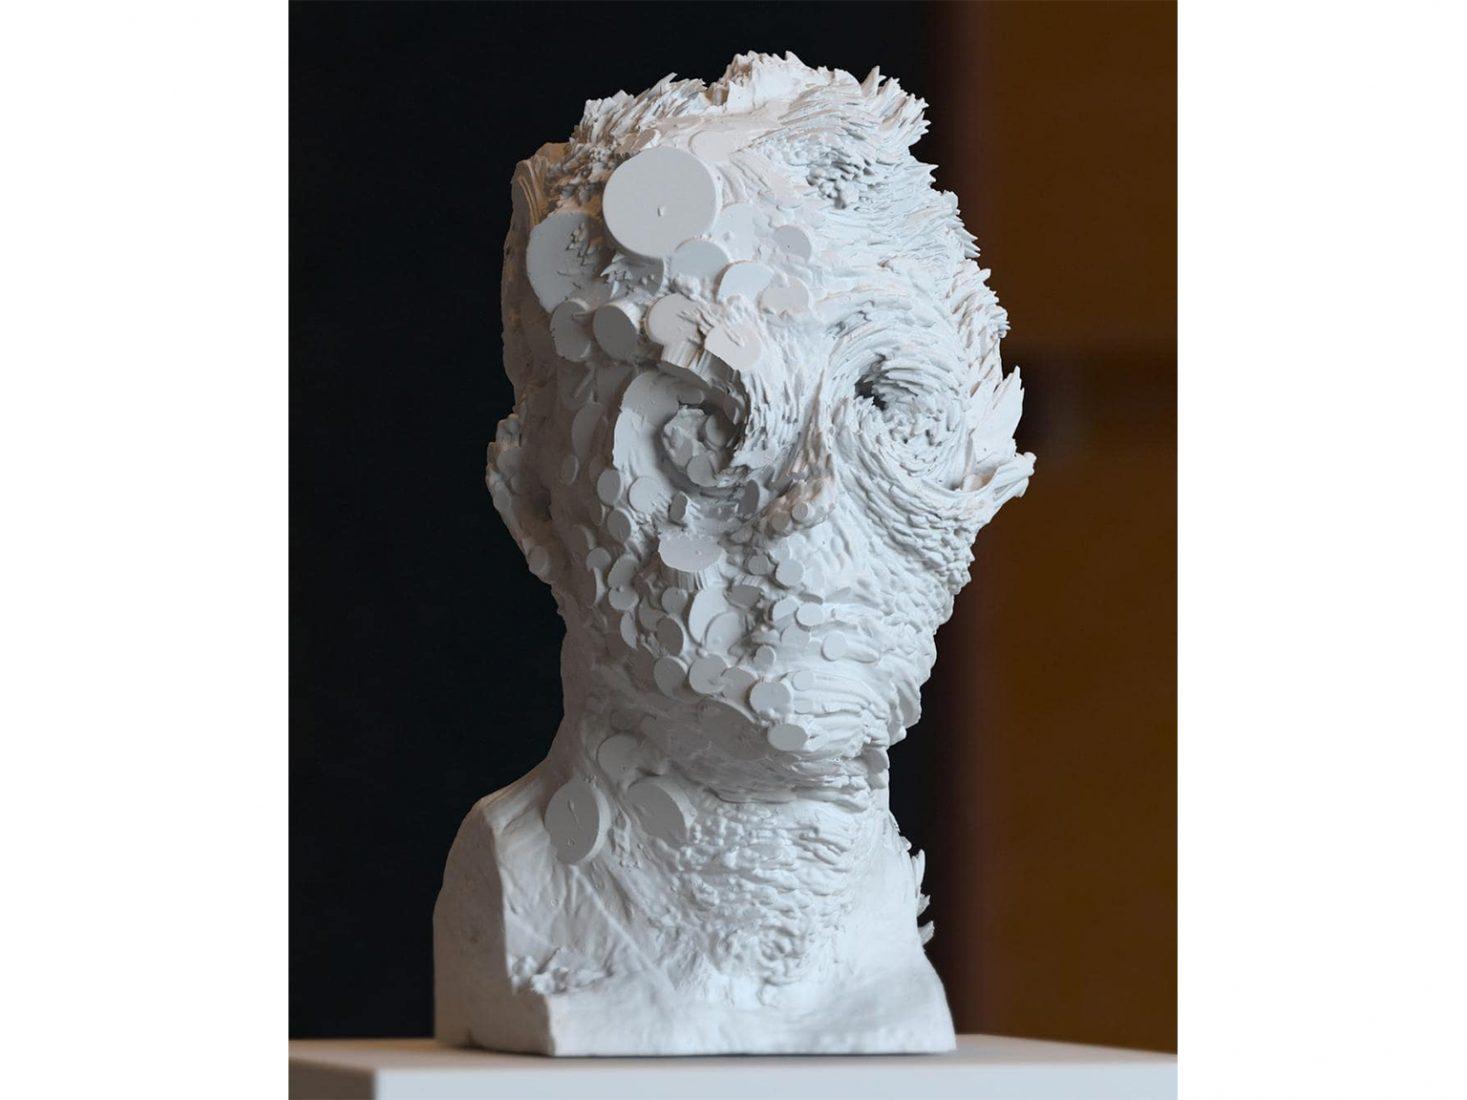 Николай Константинов. Апофис, 2017, гипс, 36 х 30 х 27 см